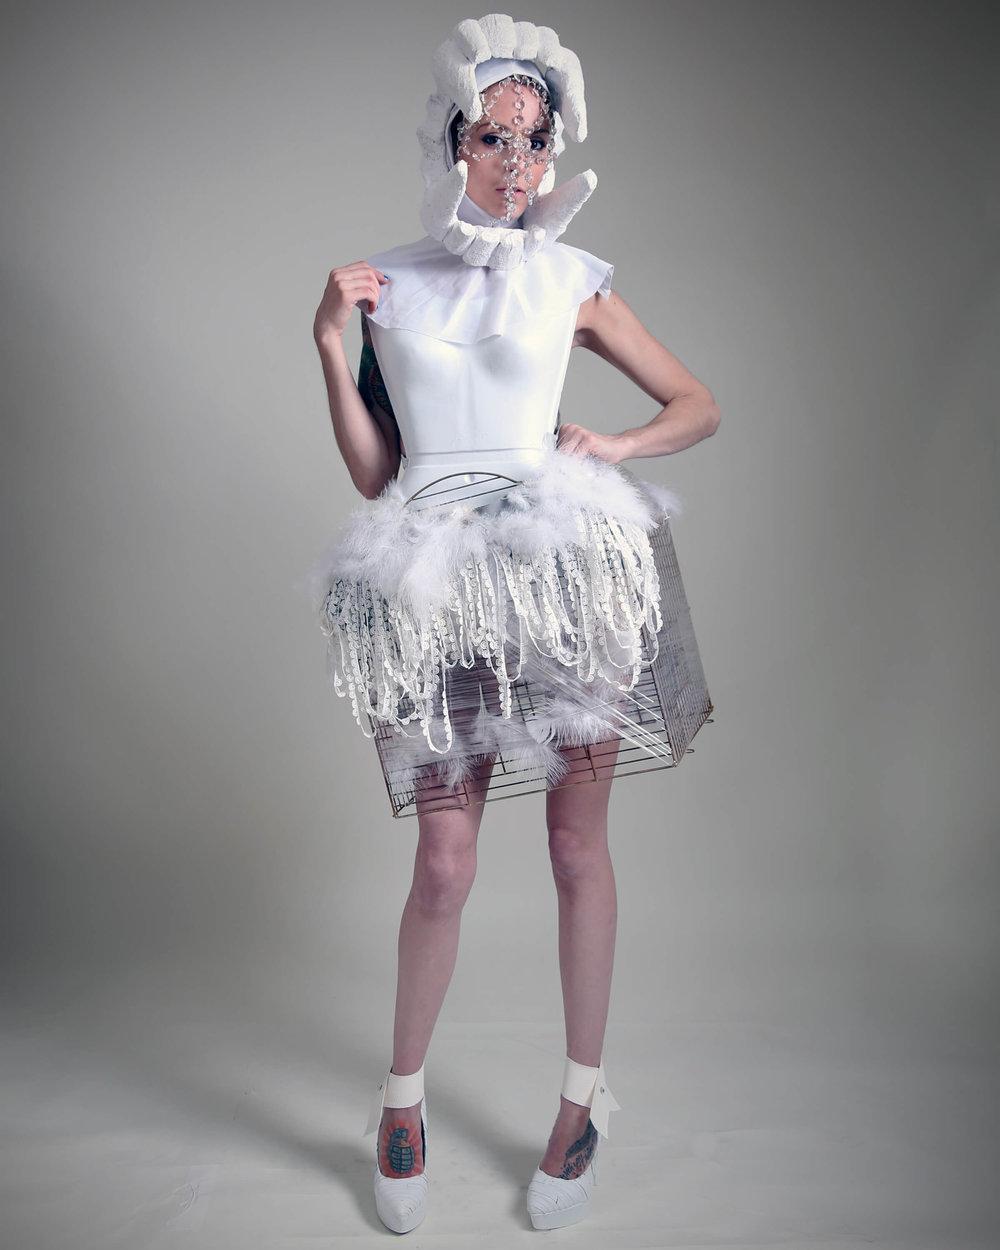 fashion_sammiller.jpg